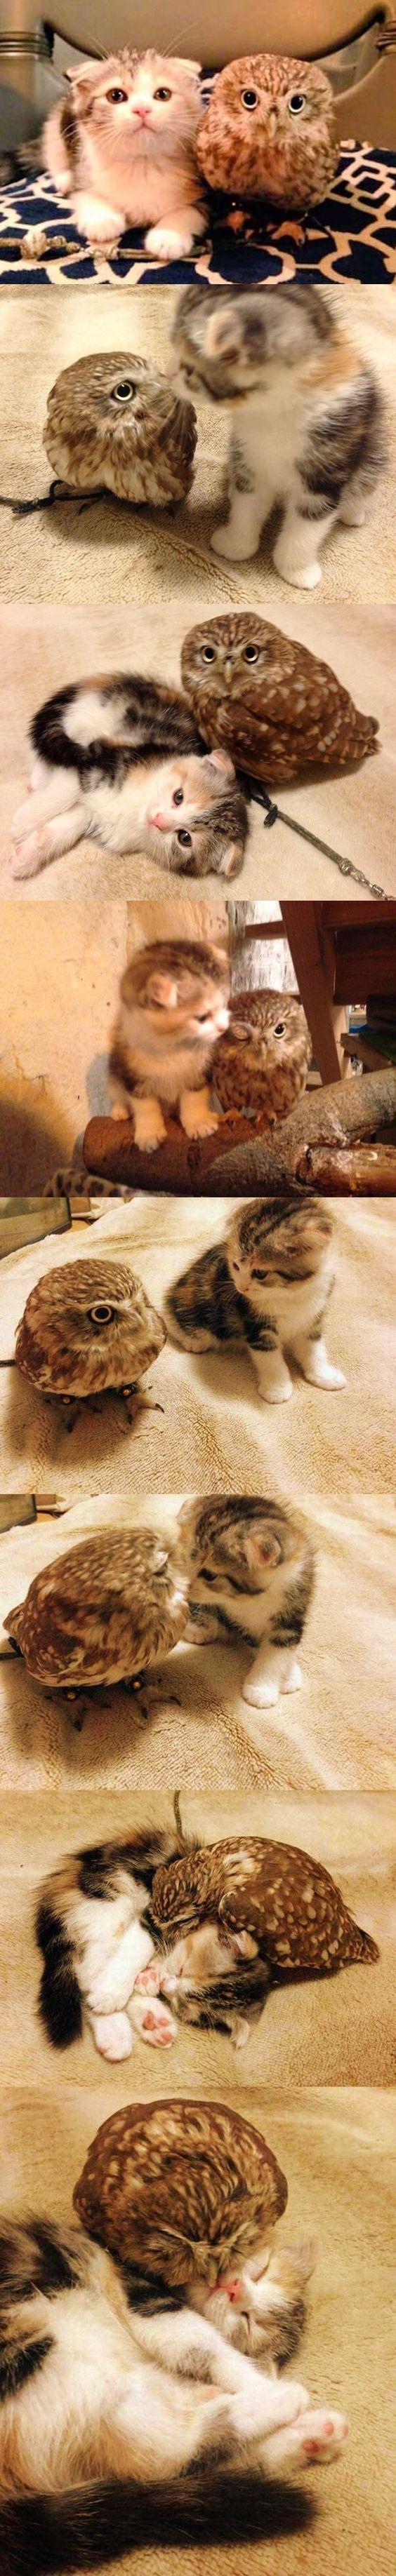 Best A Cute Animal Images On Pinterest Baby Animals Baby - Owlet kitten meet coffee shop become best friends